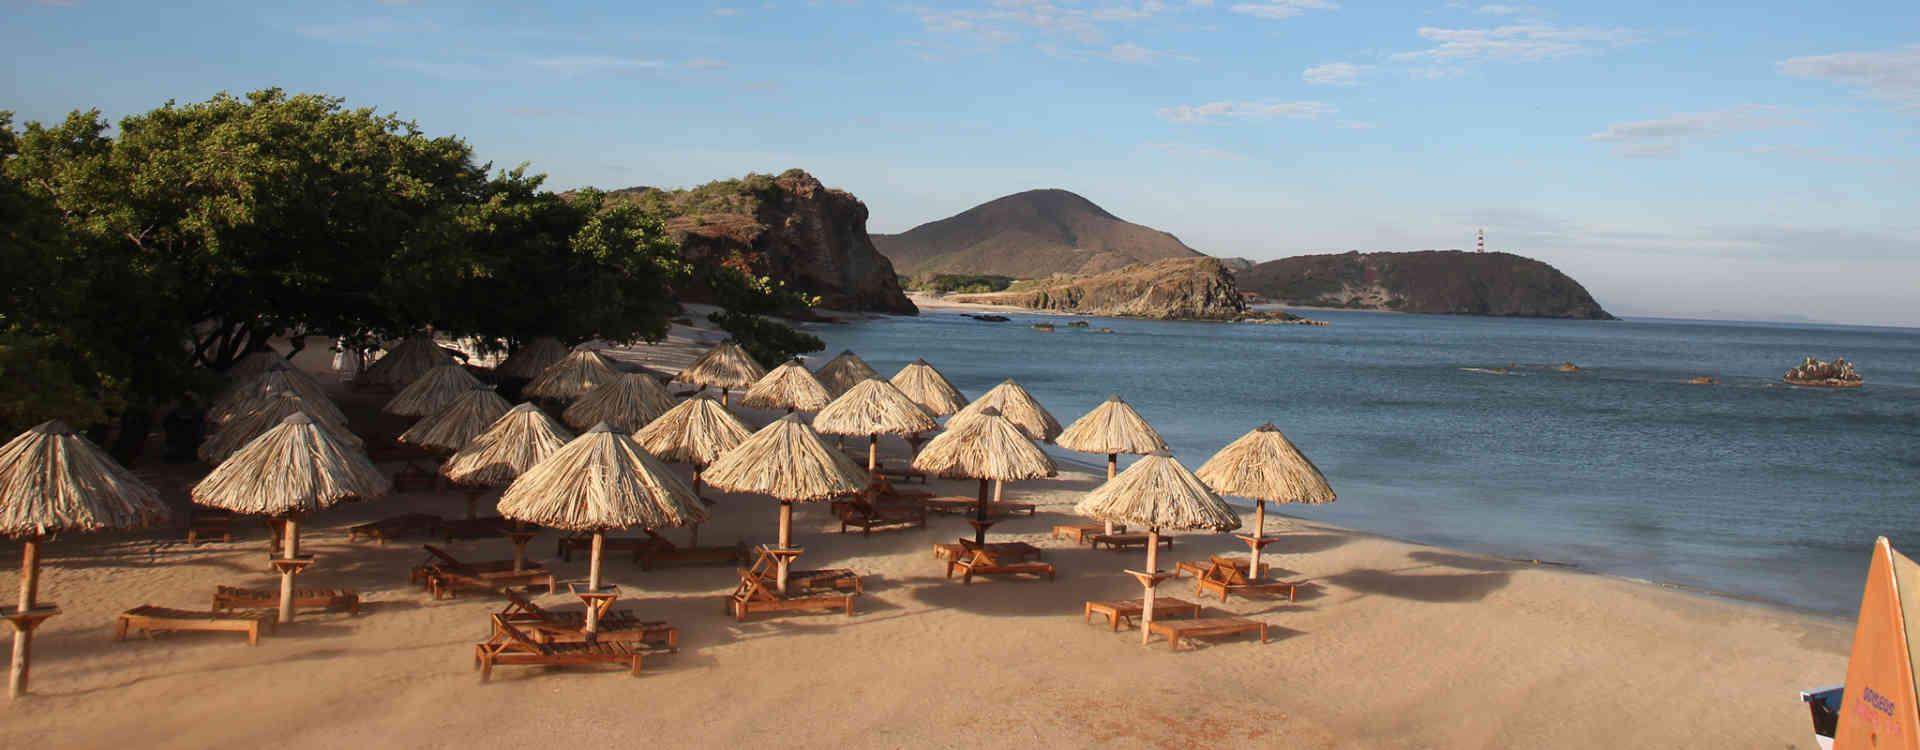 Playa Pueto Viejo Hesperia Isla Margarita